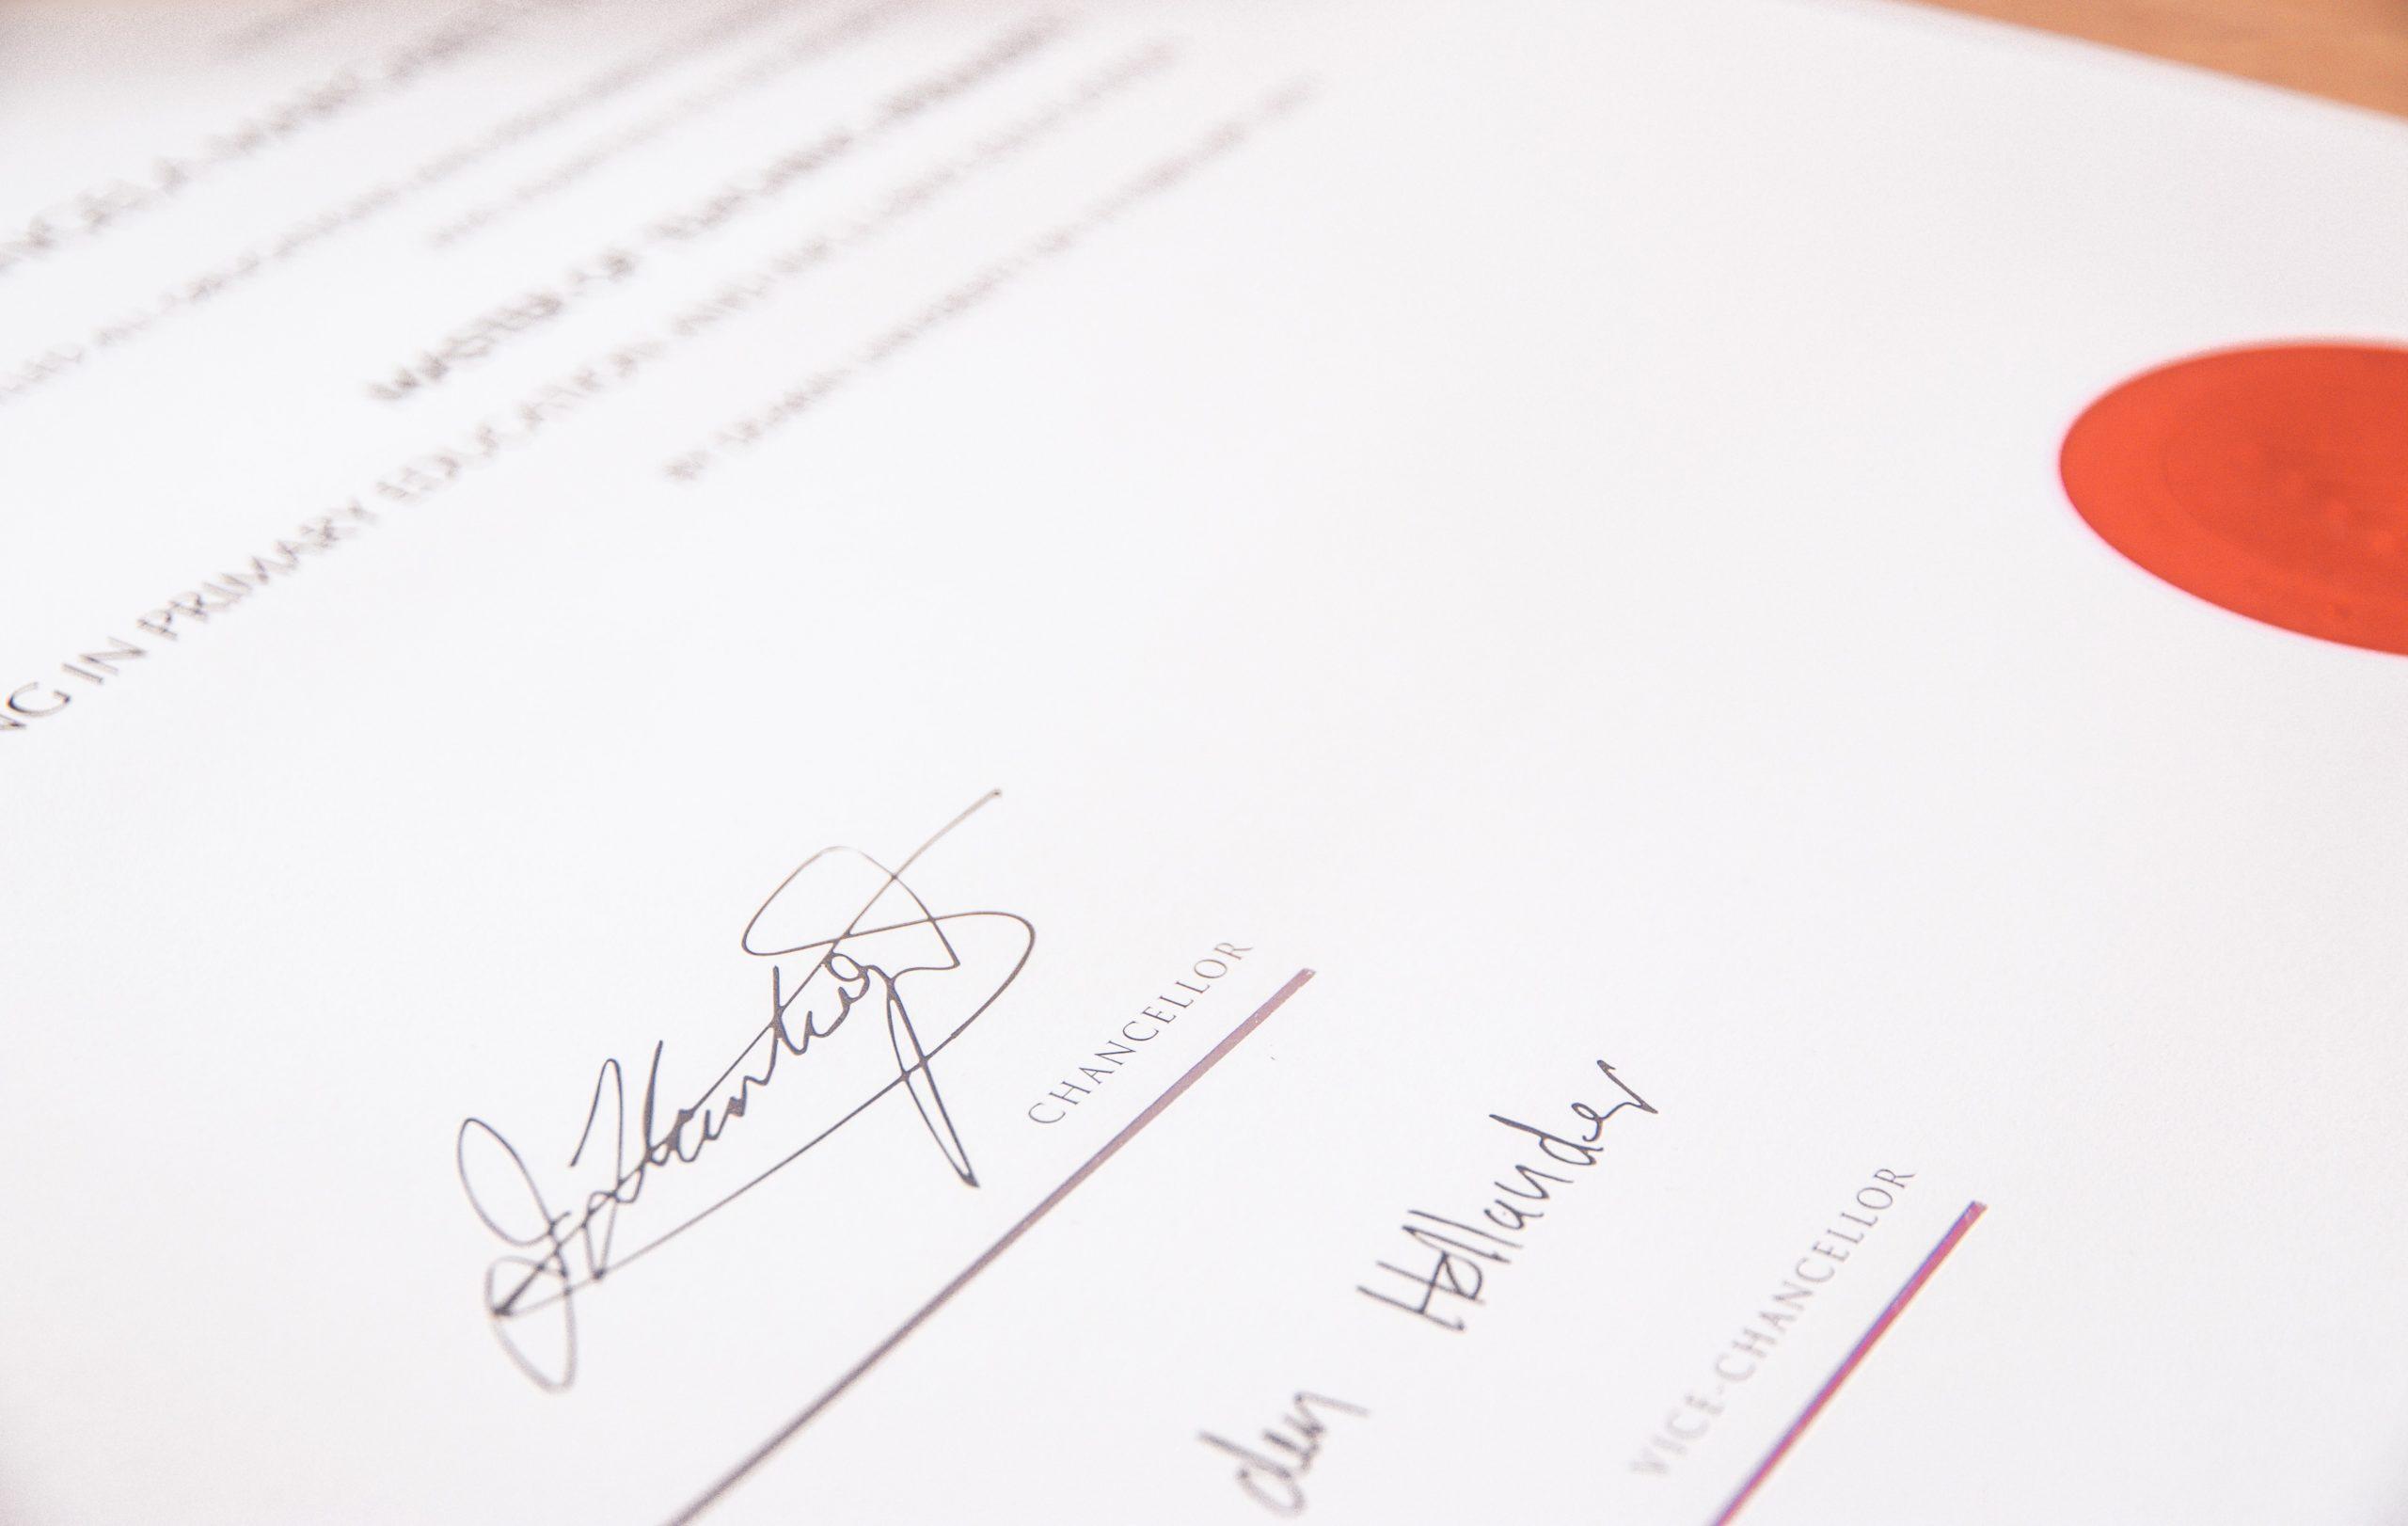 USA Certificate Attestation in UAE, Abu Dhabi, Dubai, Sharjah